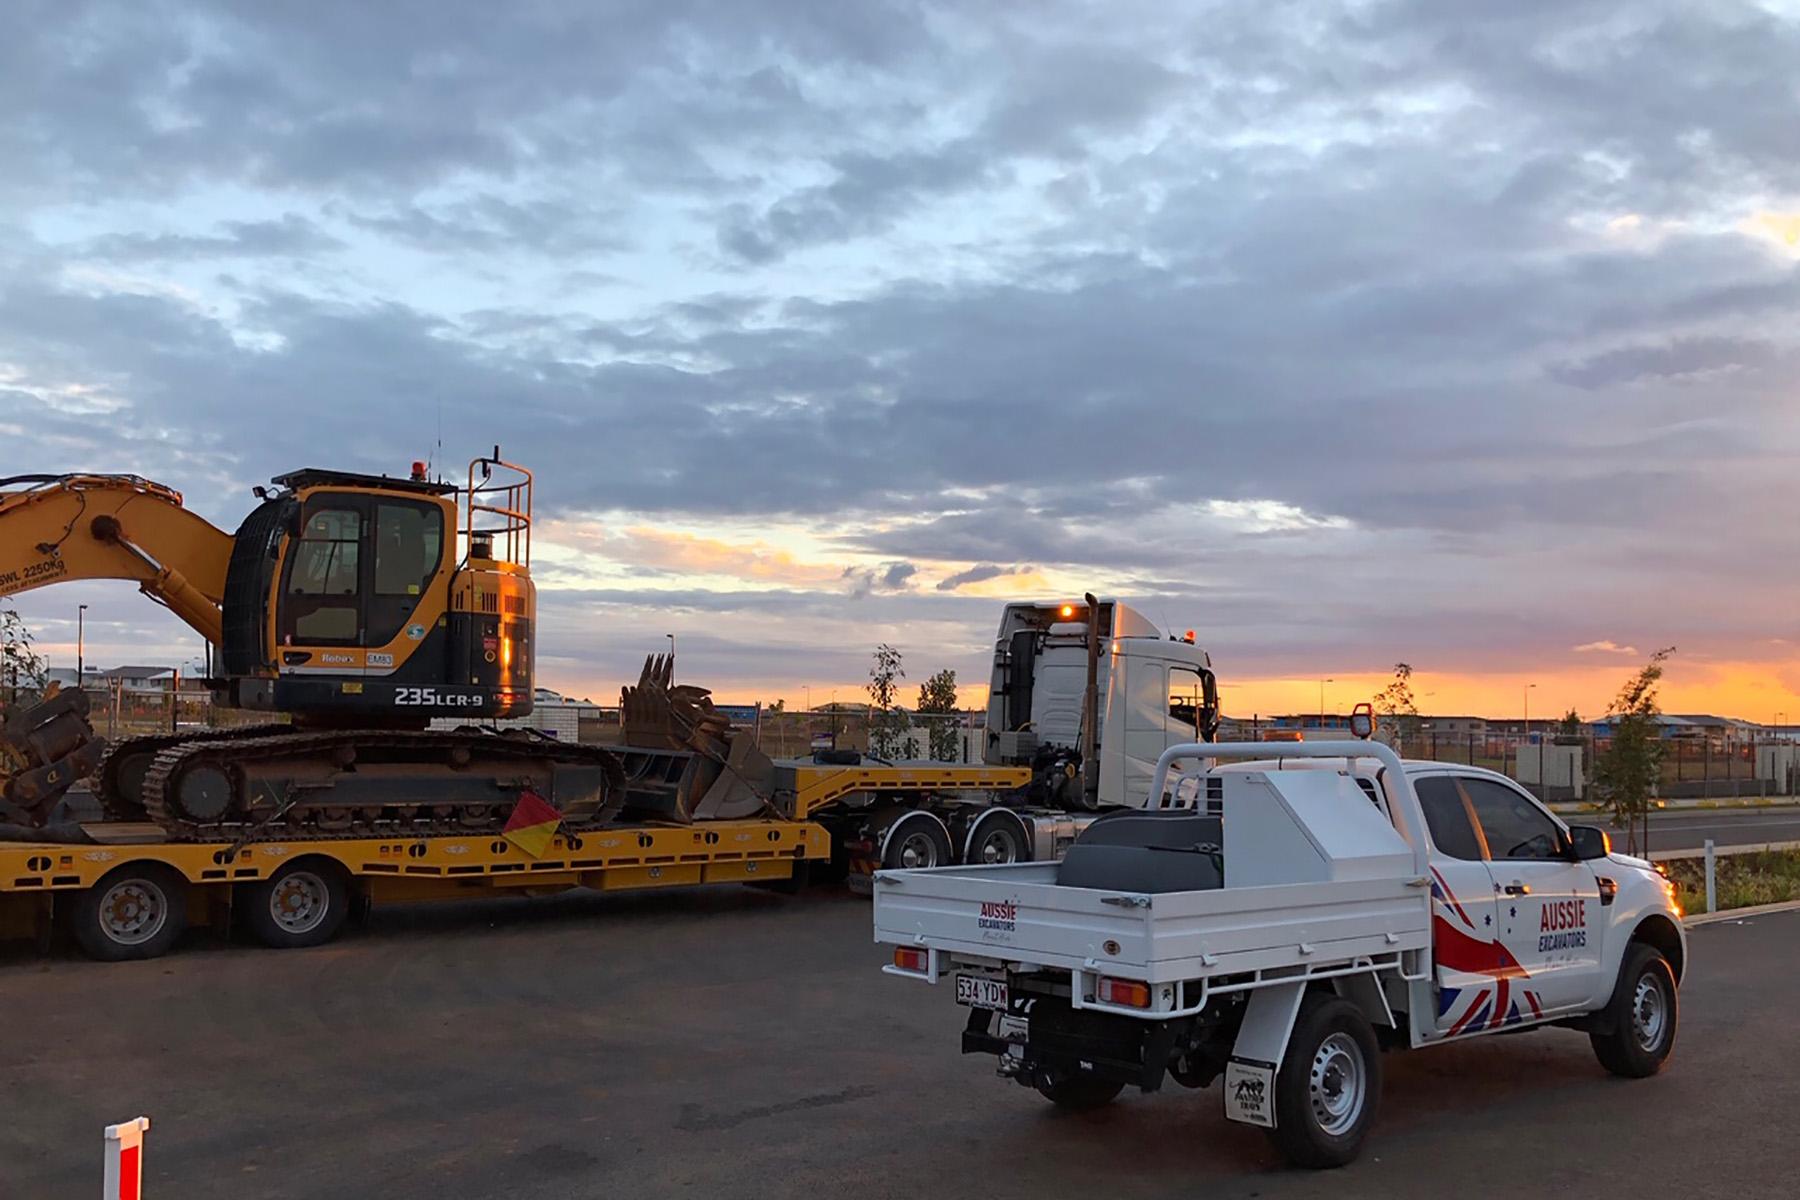 excavator hire - plant hire company brisbane